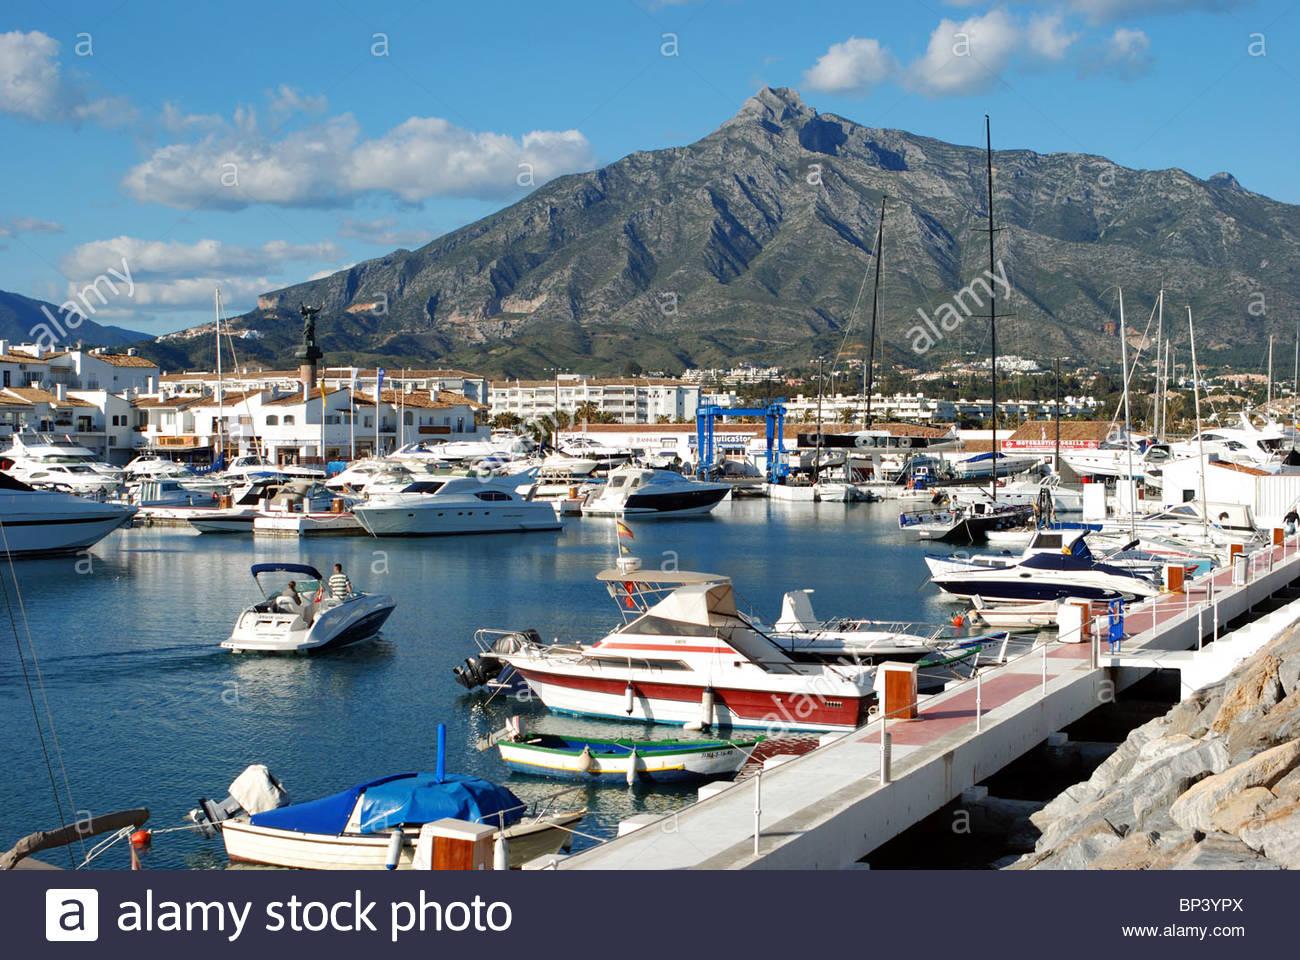 Marbella stock photos marbella stock images alamy for Puerto banus costa del sol